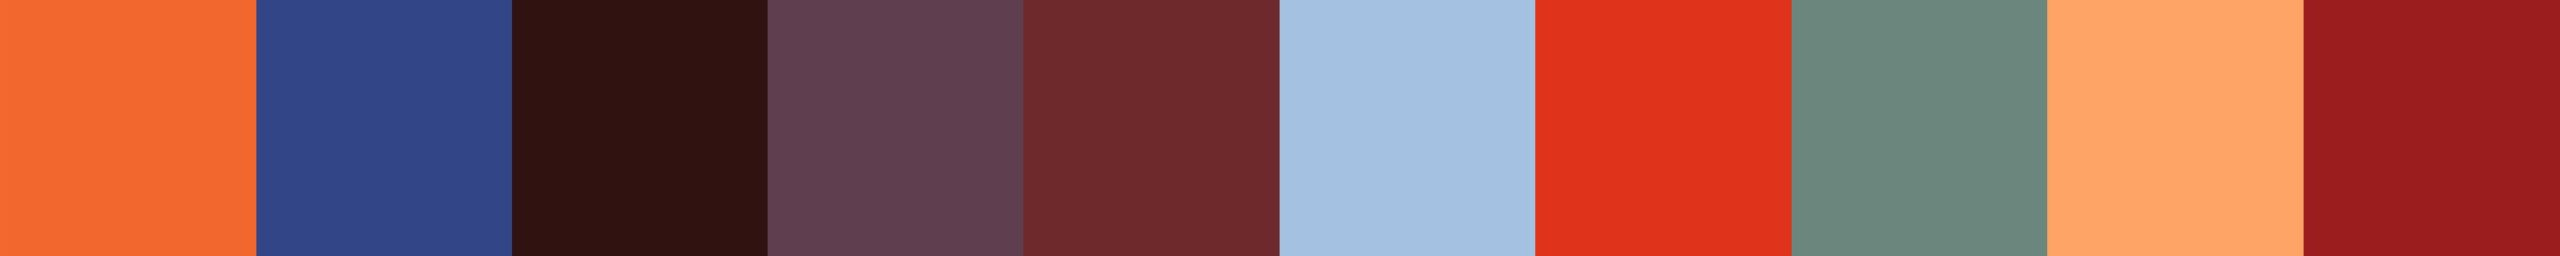 133 Theatra Color Palette